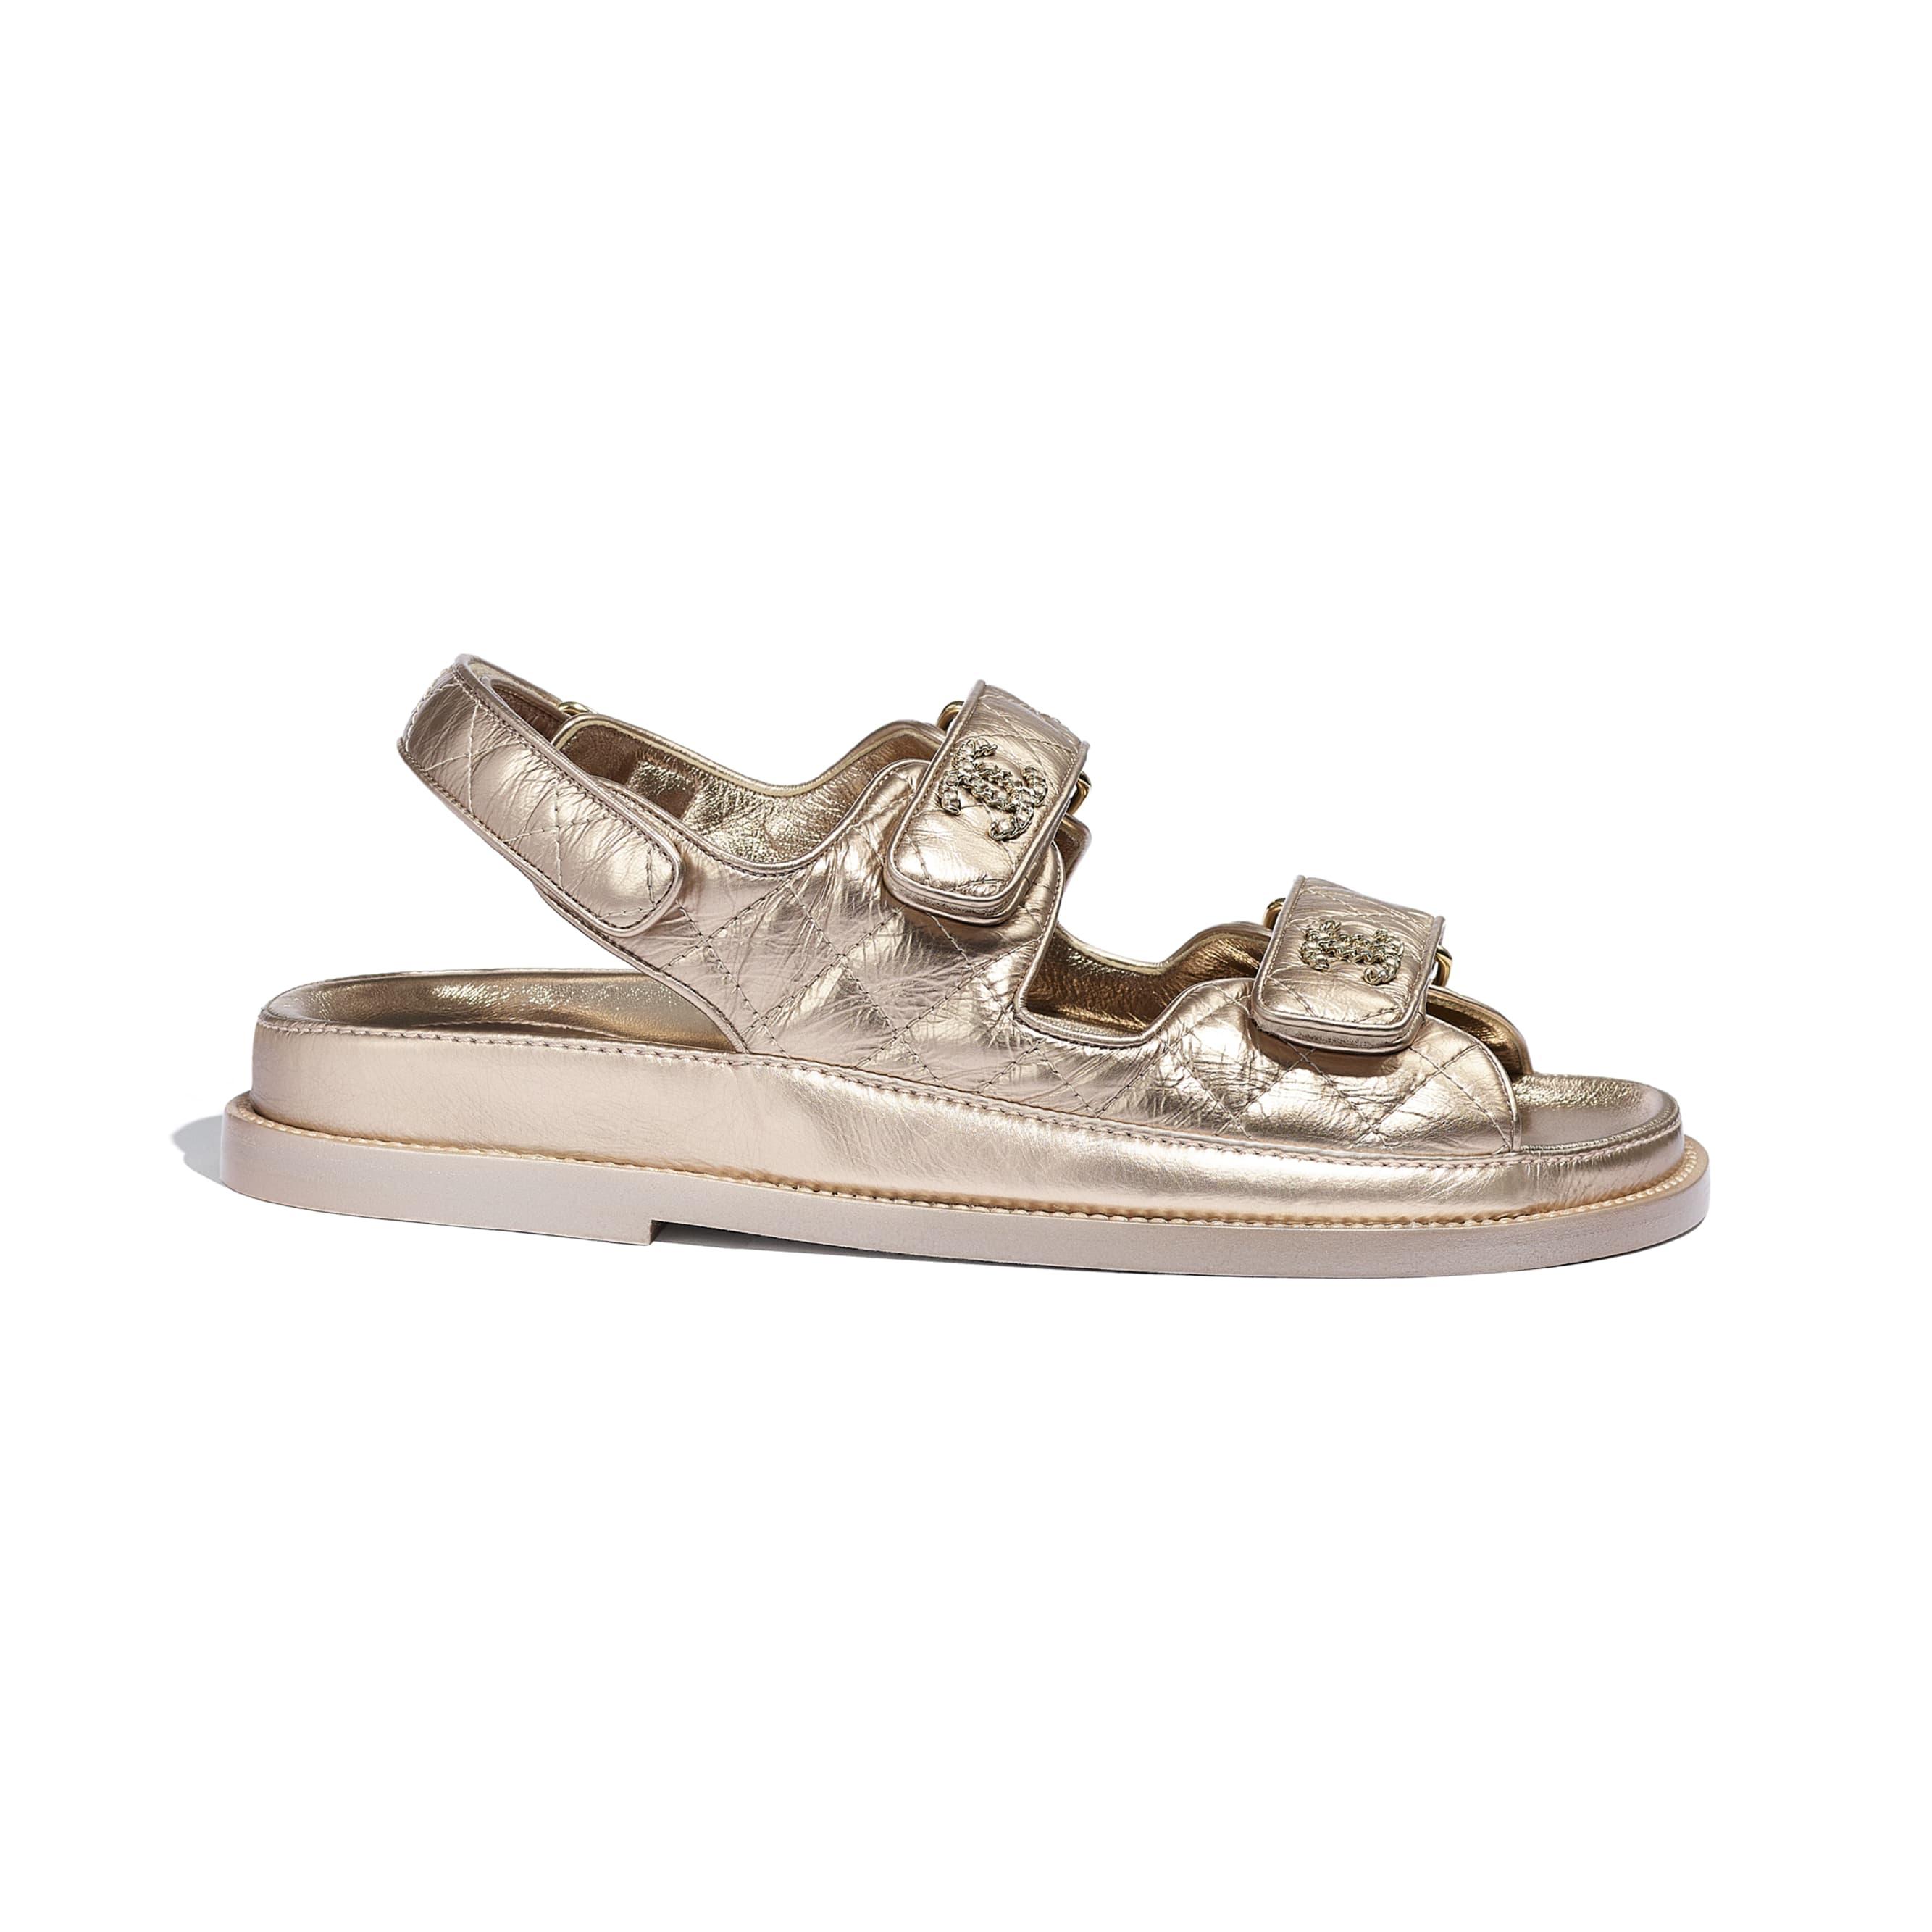 Sandals - Light Bronze - Iridescent Lambskin - CHANEL - Default view - see standard sized version